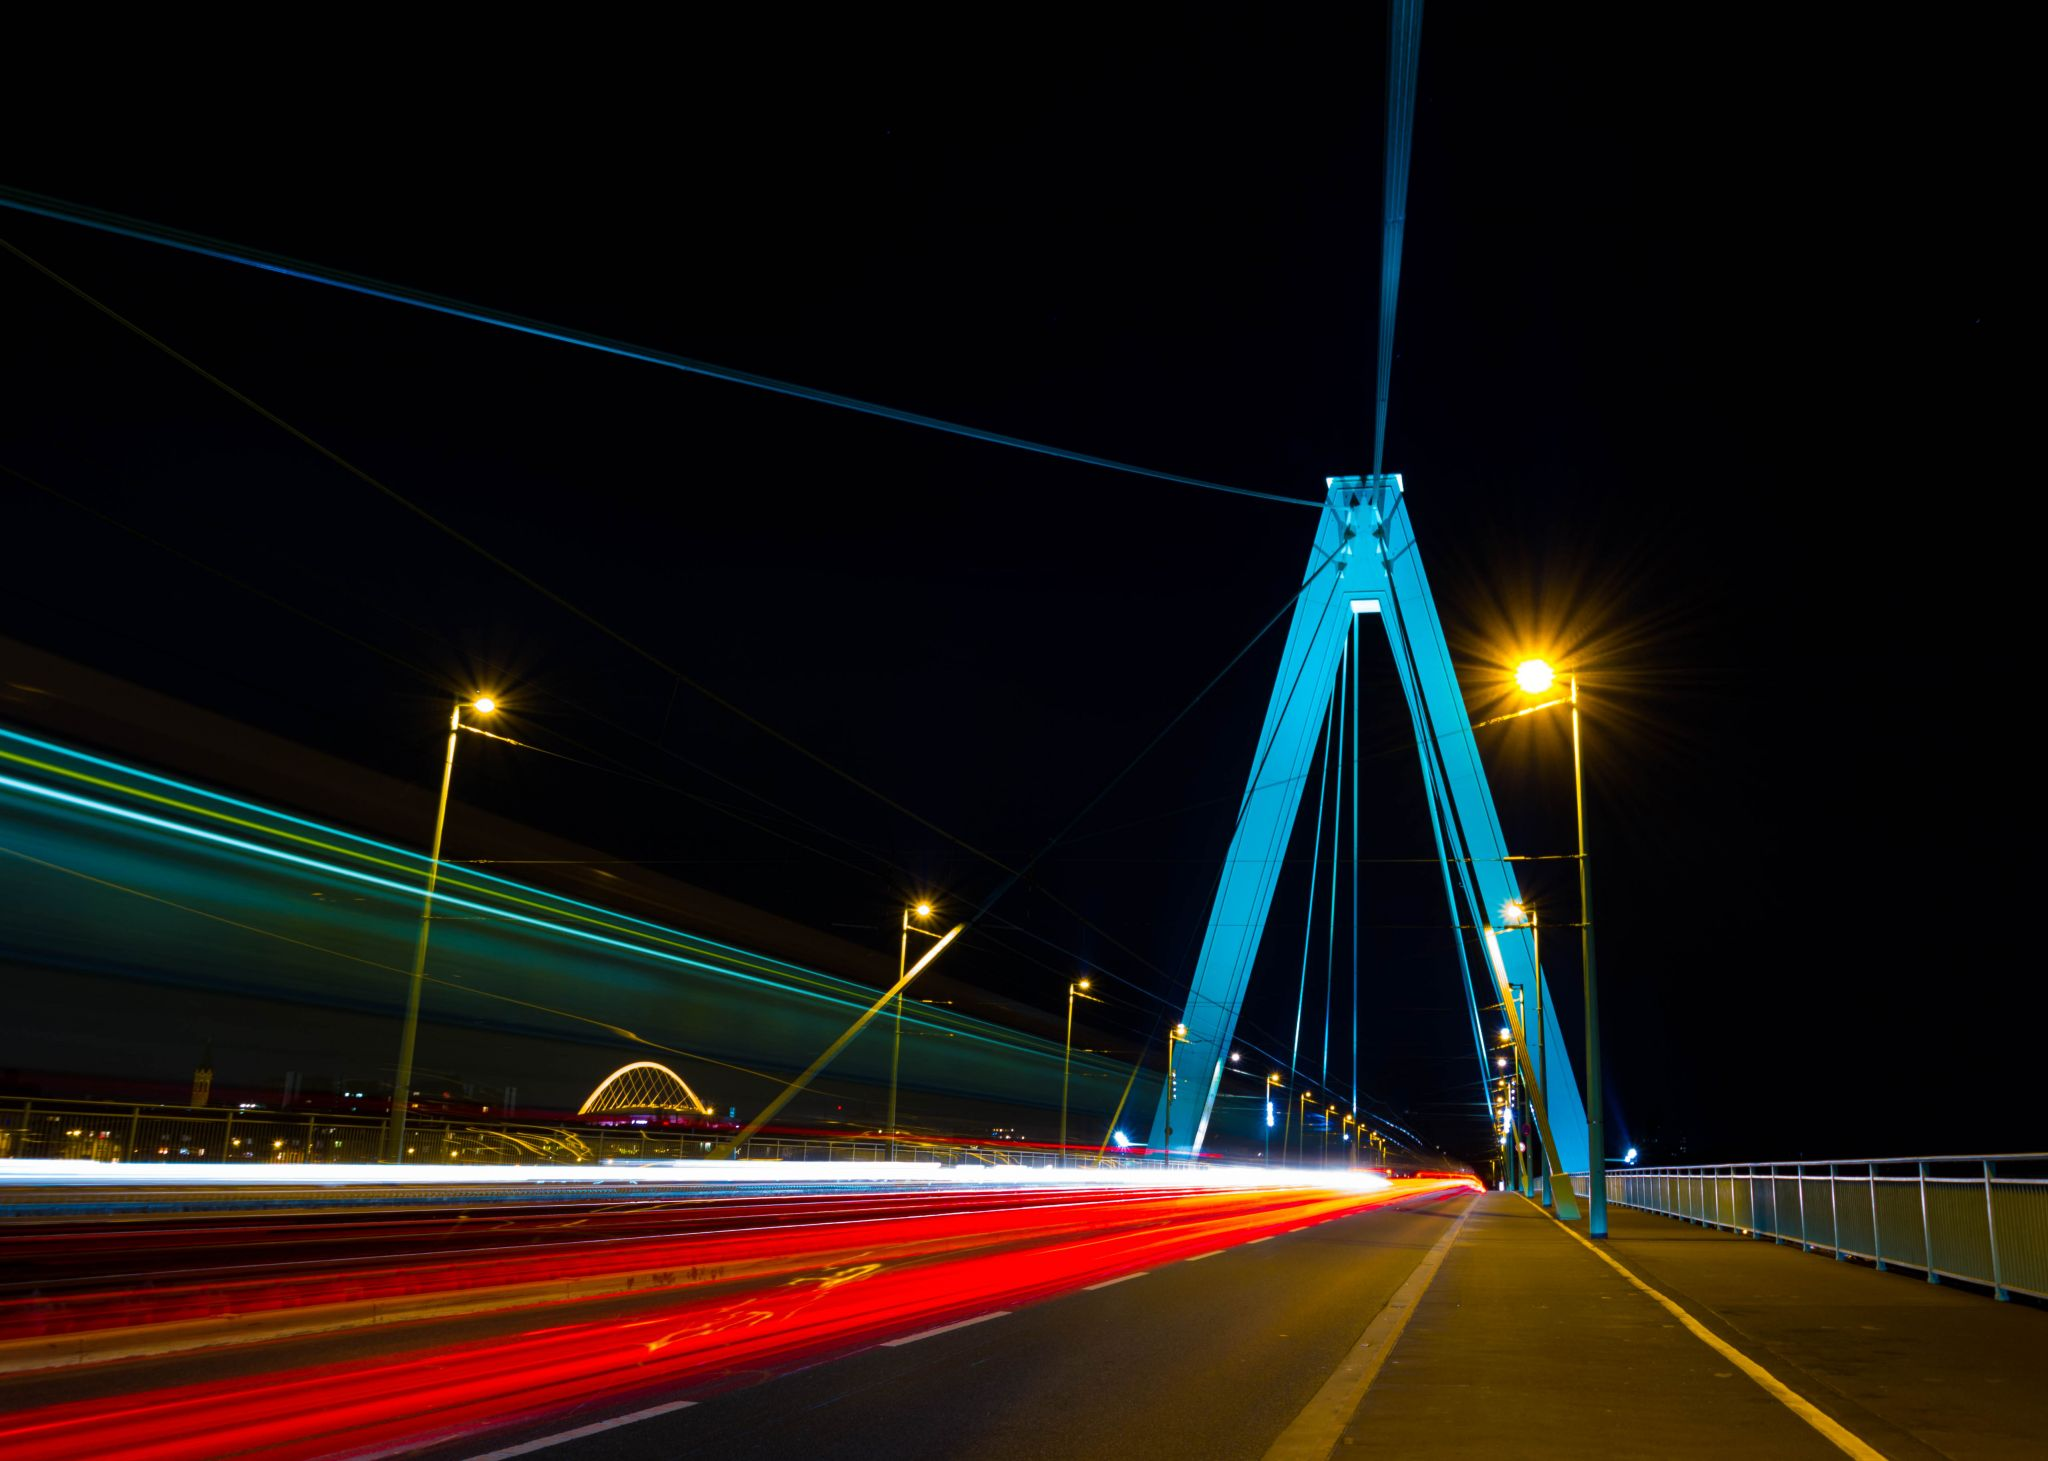 Severinsbrücke, Cologne, Germany